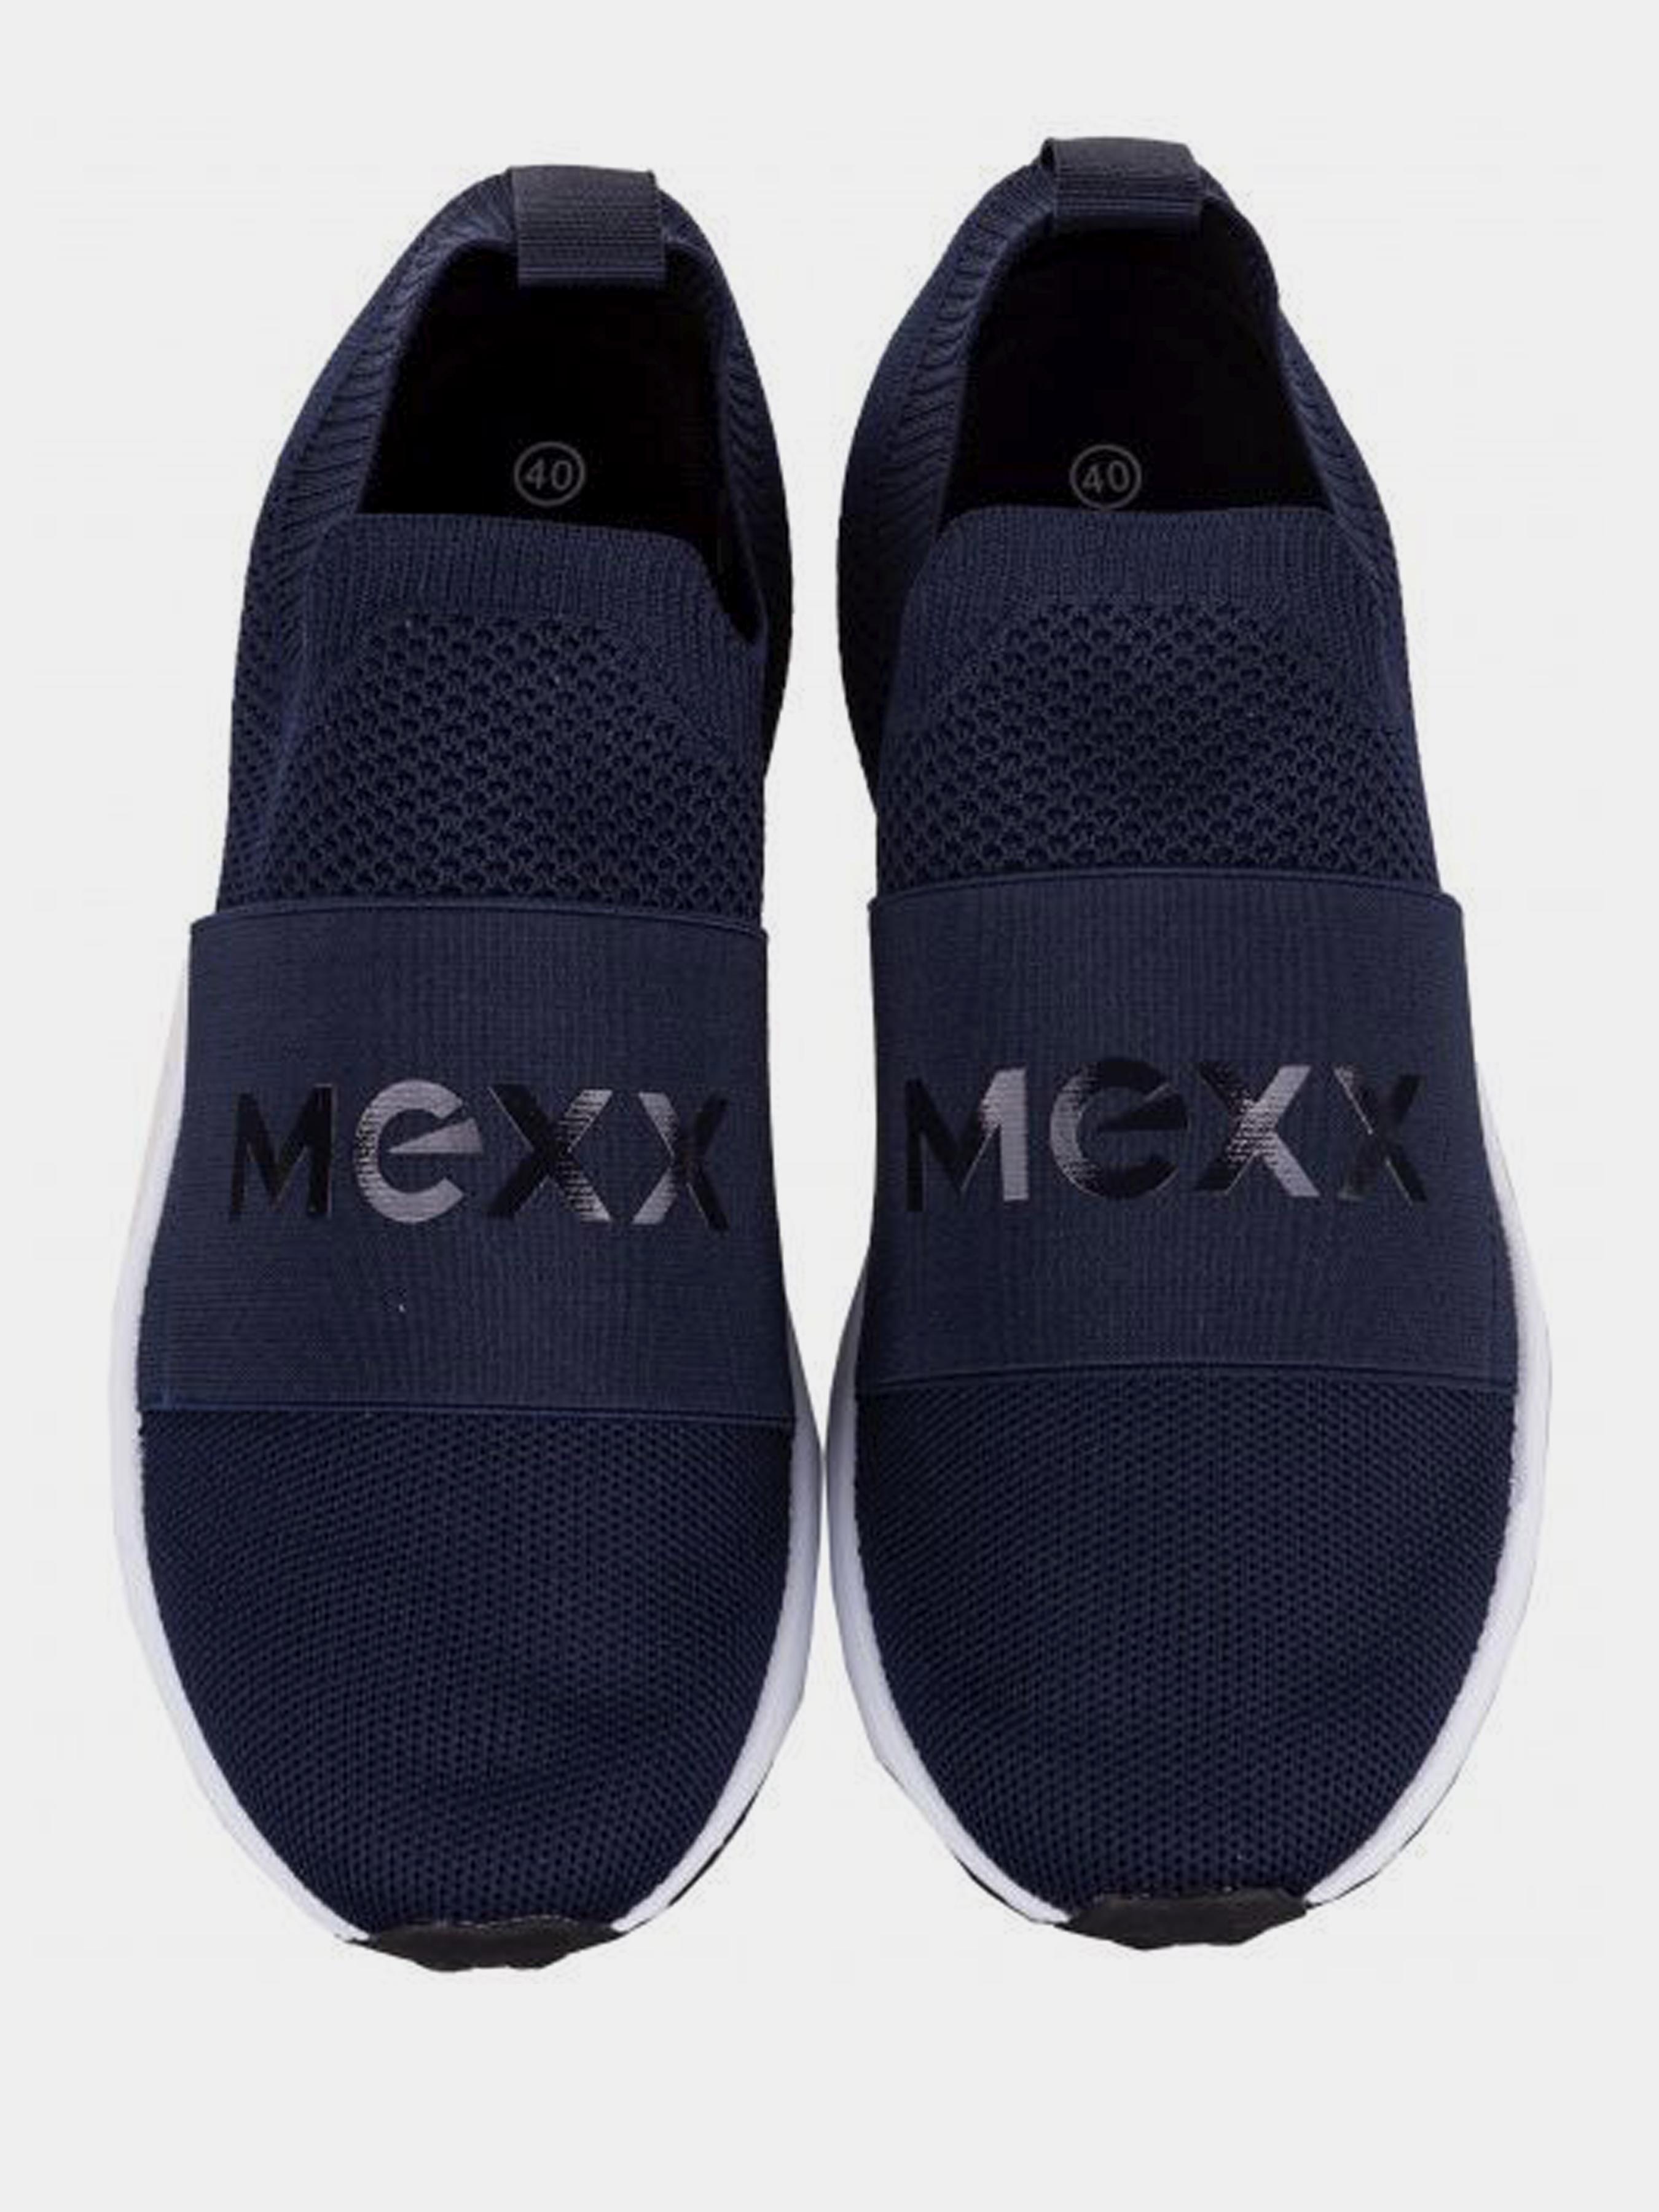 Кроссовки для мужчин MEXX Chento 7M21 купить обувь, 2017